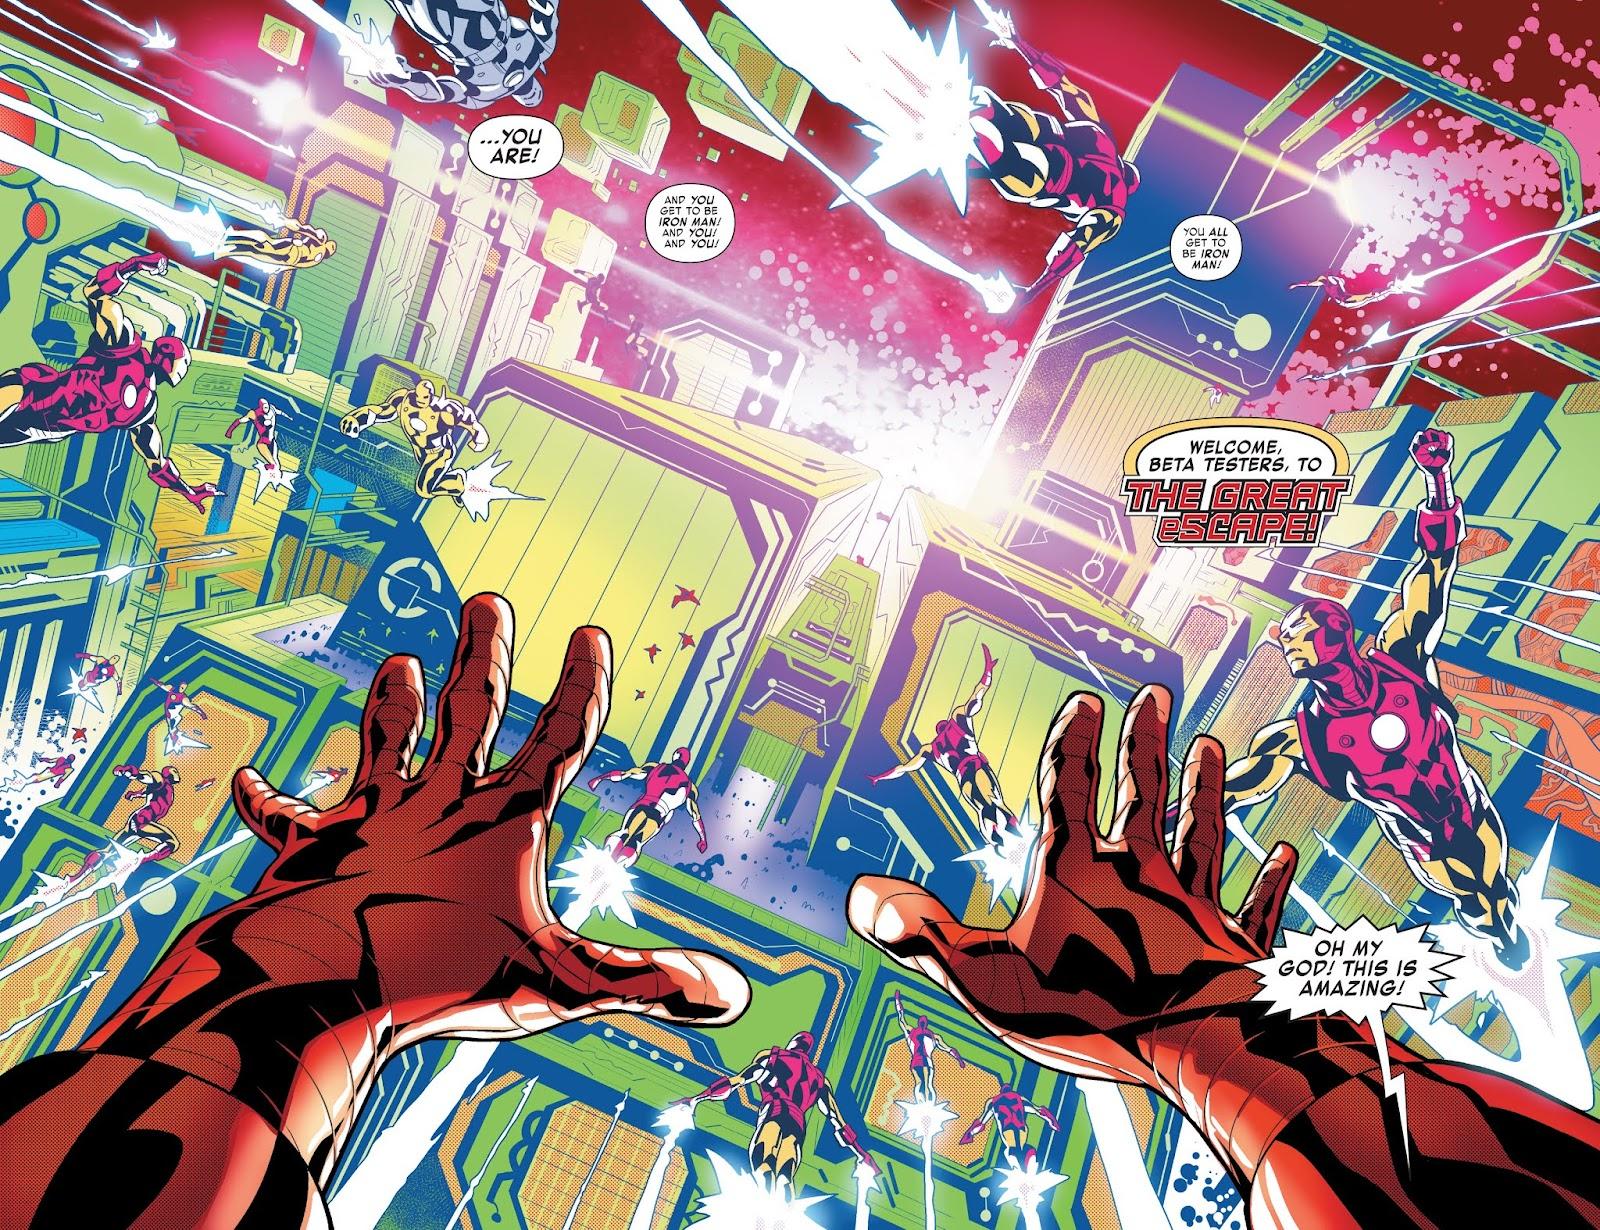 Read online Tony Stark: Iron Man comic -  Issue #3 - 4